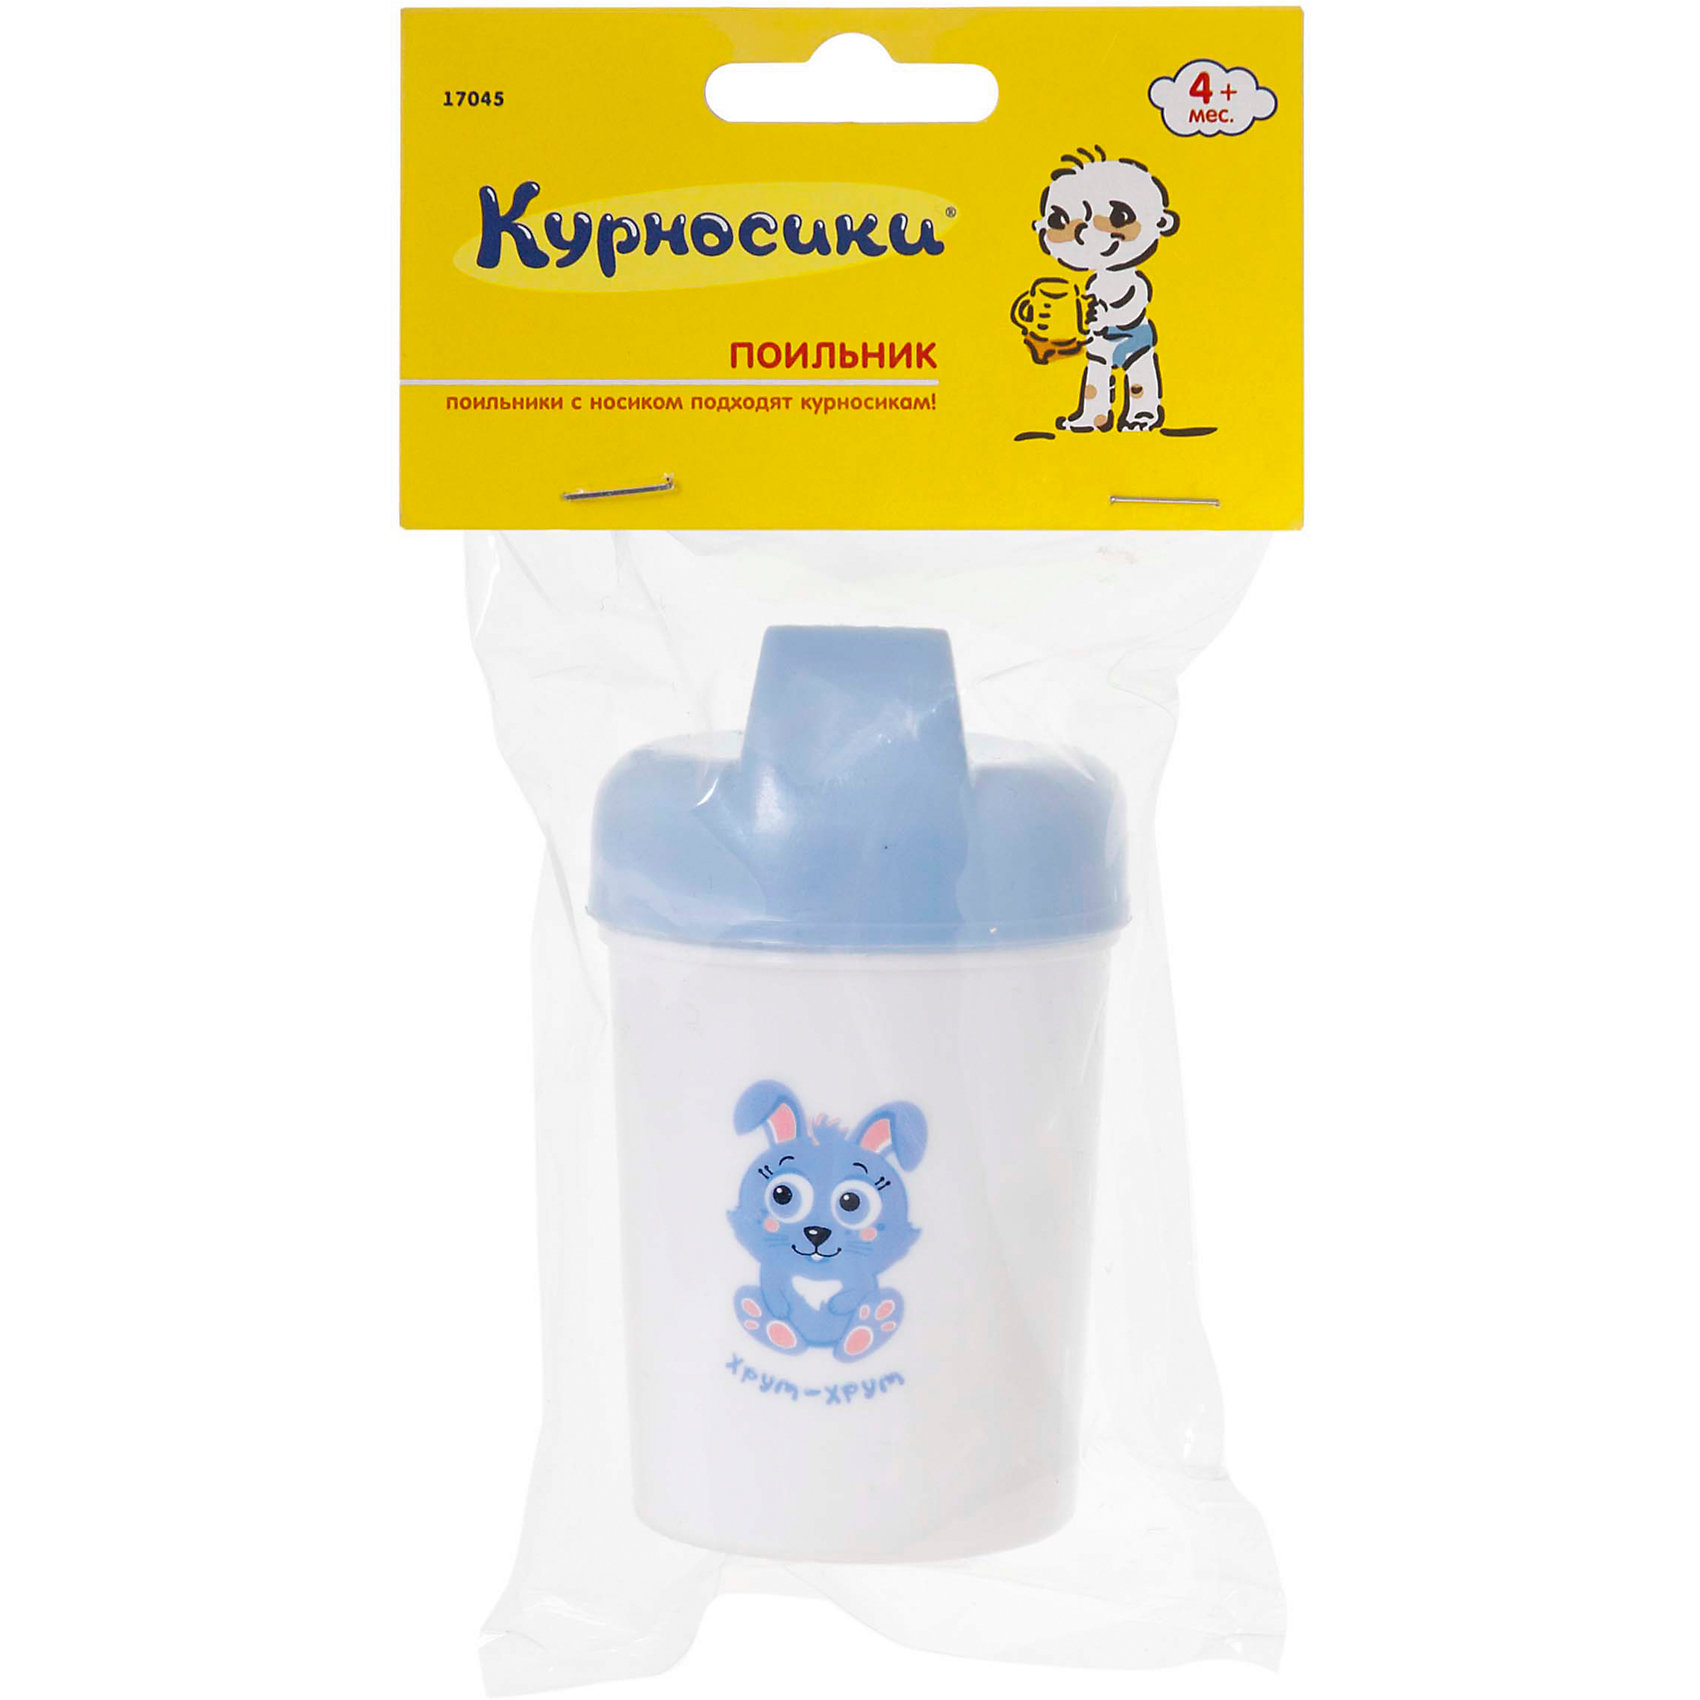 Курносики Поильник маленький 4+, 125мл, Kurnosiki, голубой